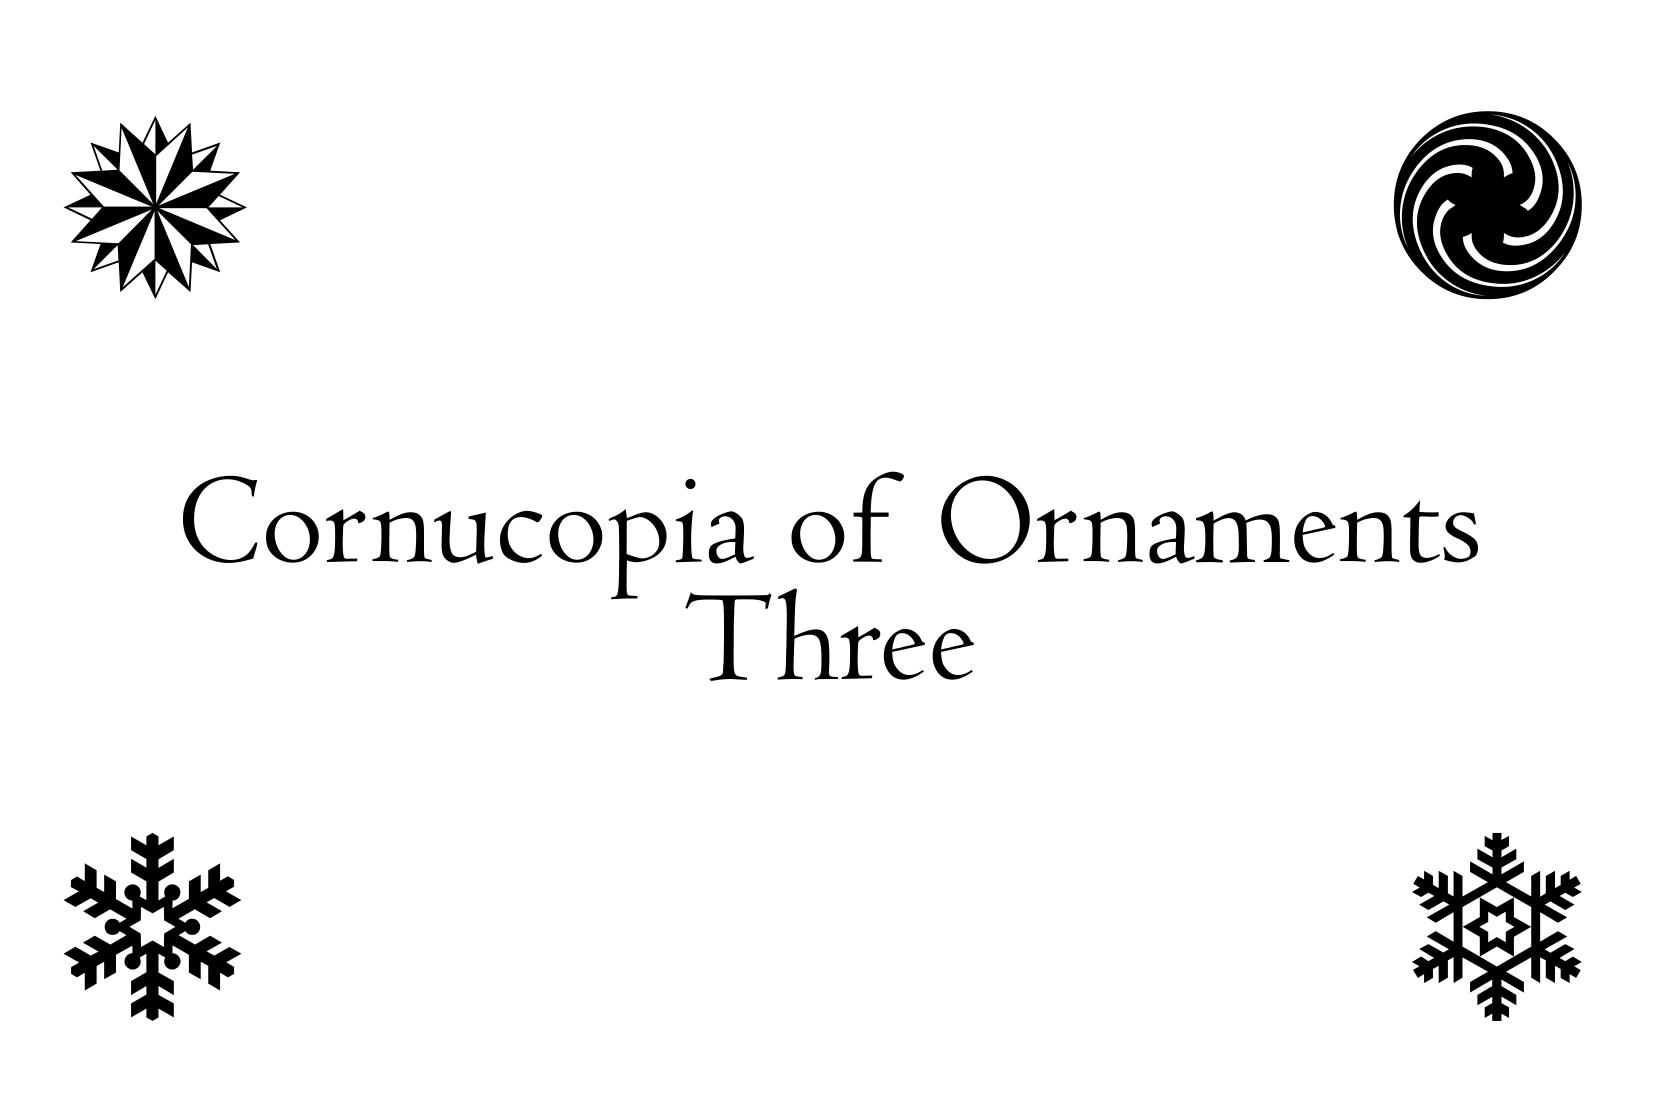 Cornucopia of Ornaments Three example image 2